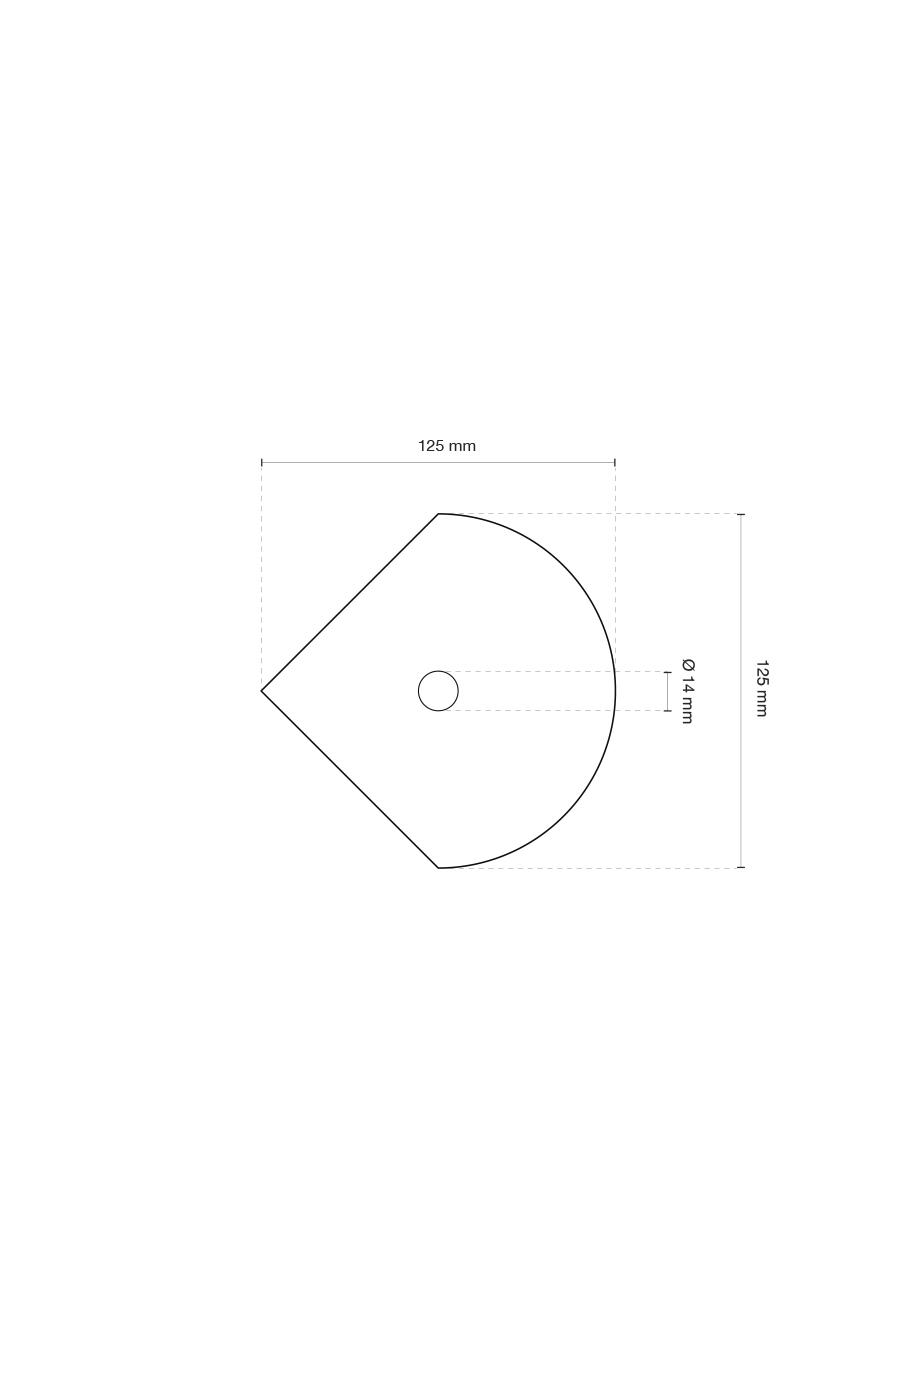 bitpart-dimensions-backplate-quadrant.jpg